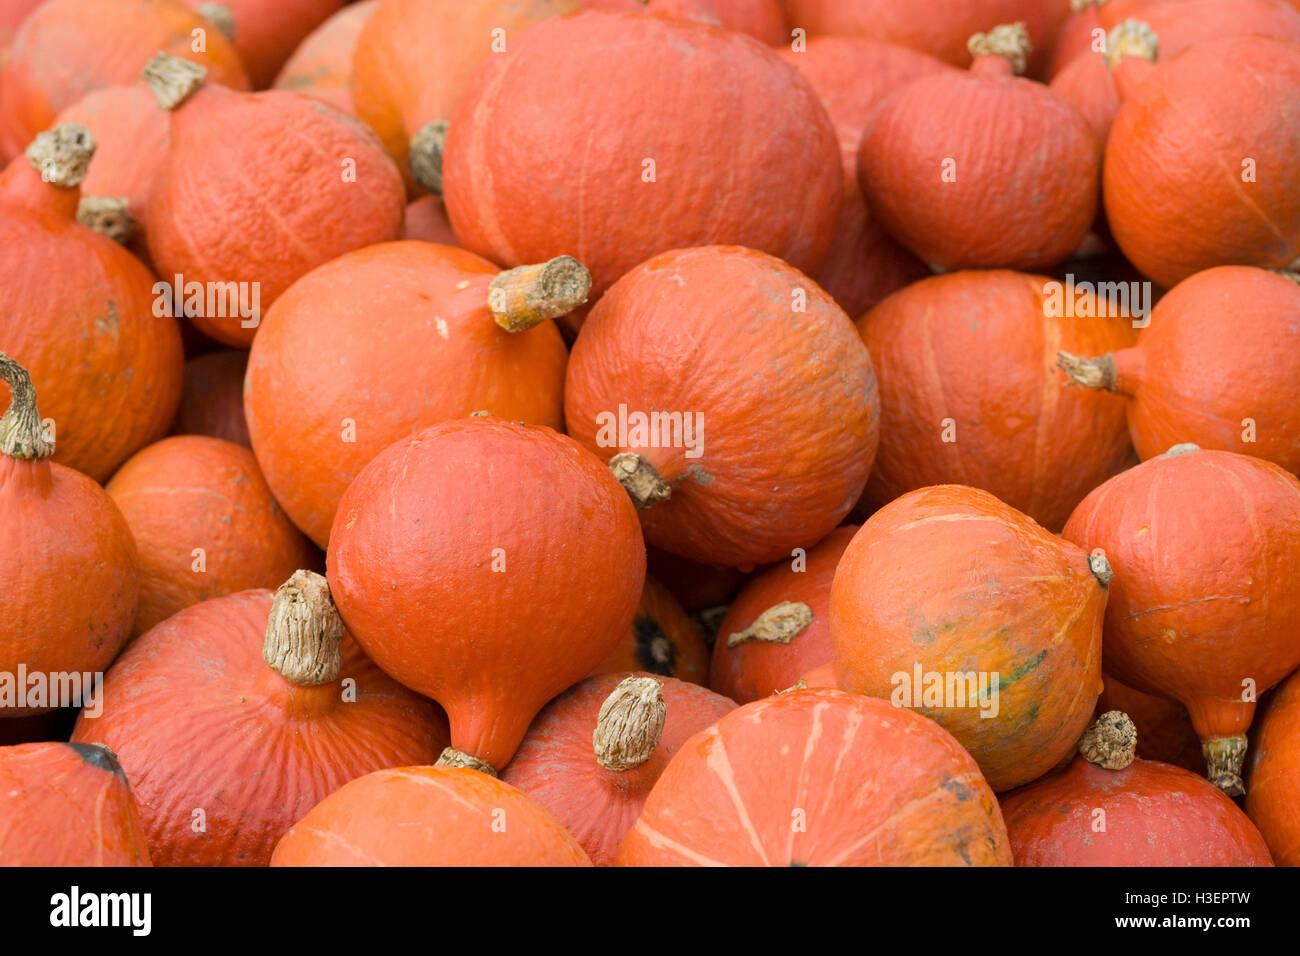 Cucurbita, Red kuri Pumpkin Stock Photo